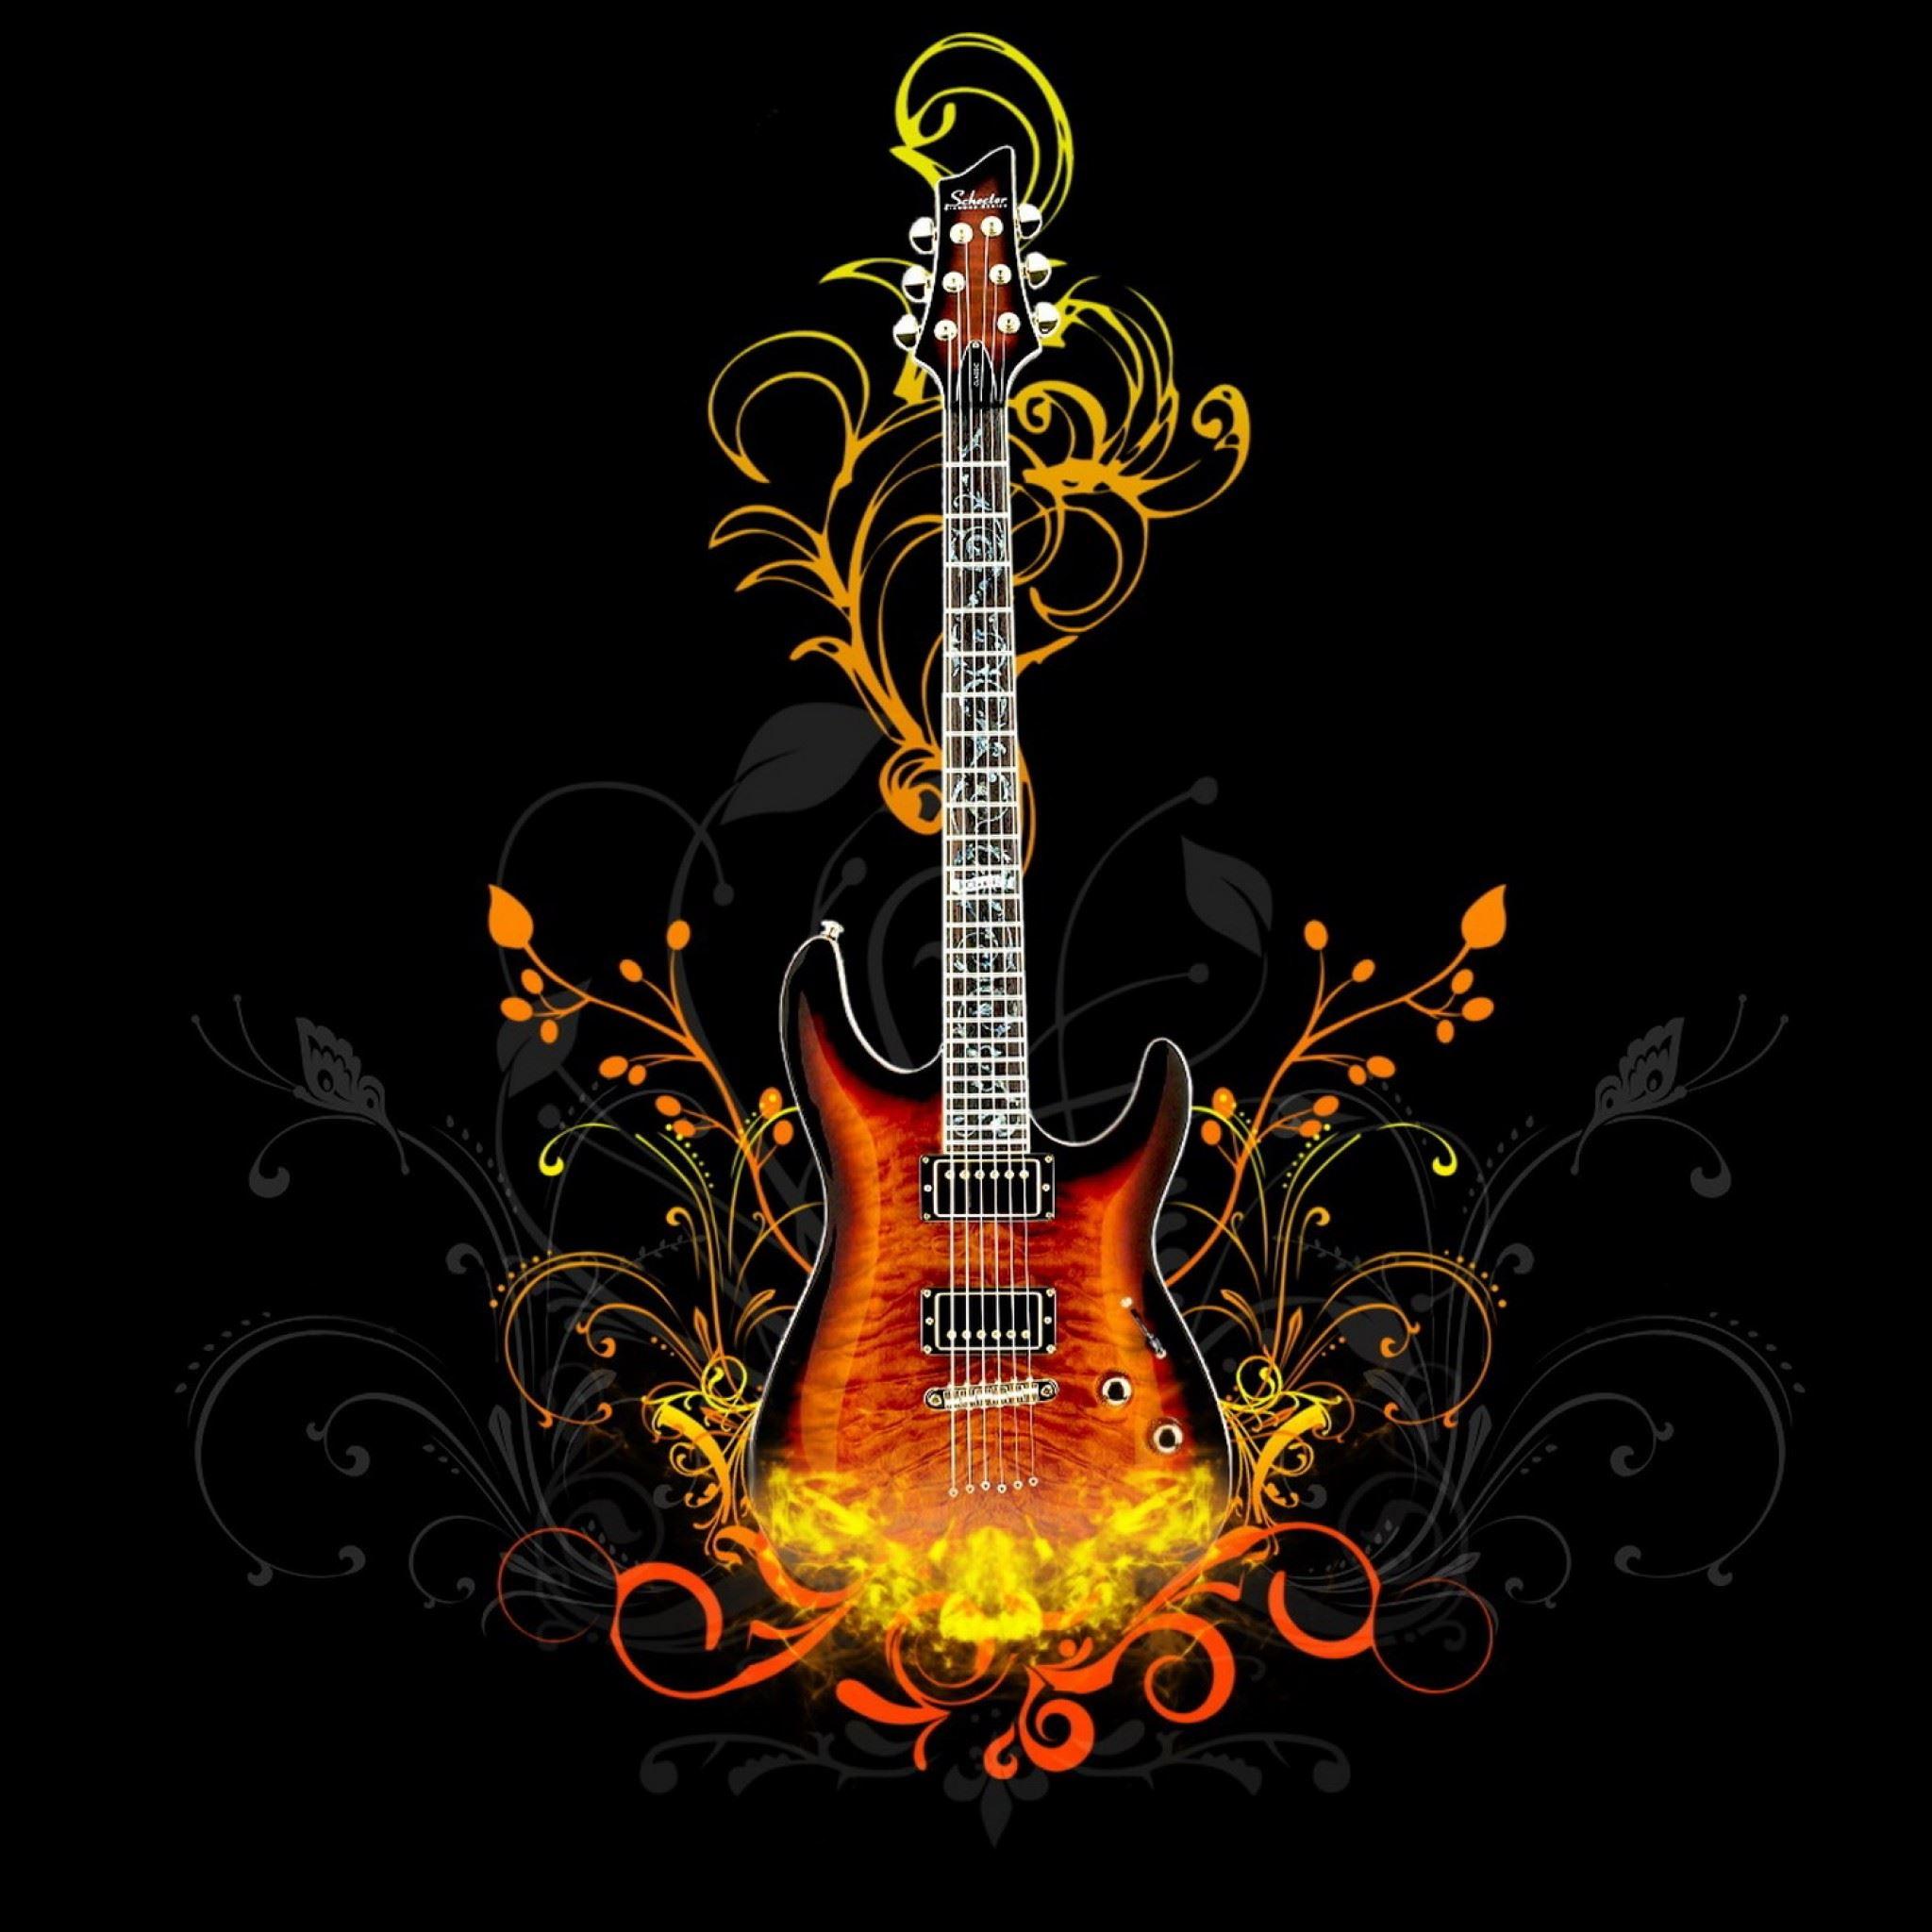 Guitar Abstract Ipad Air Wallpapers Free Download